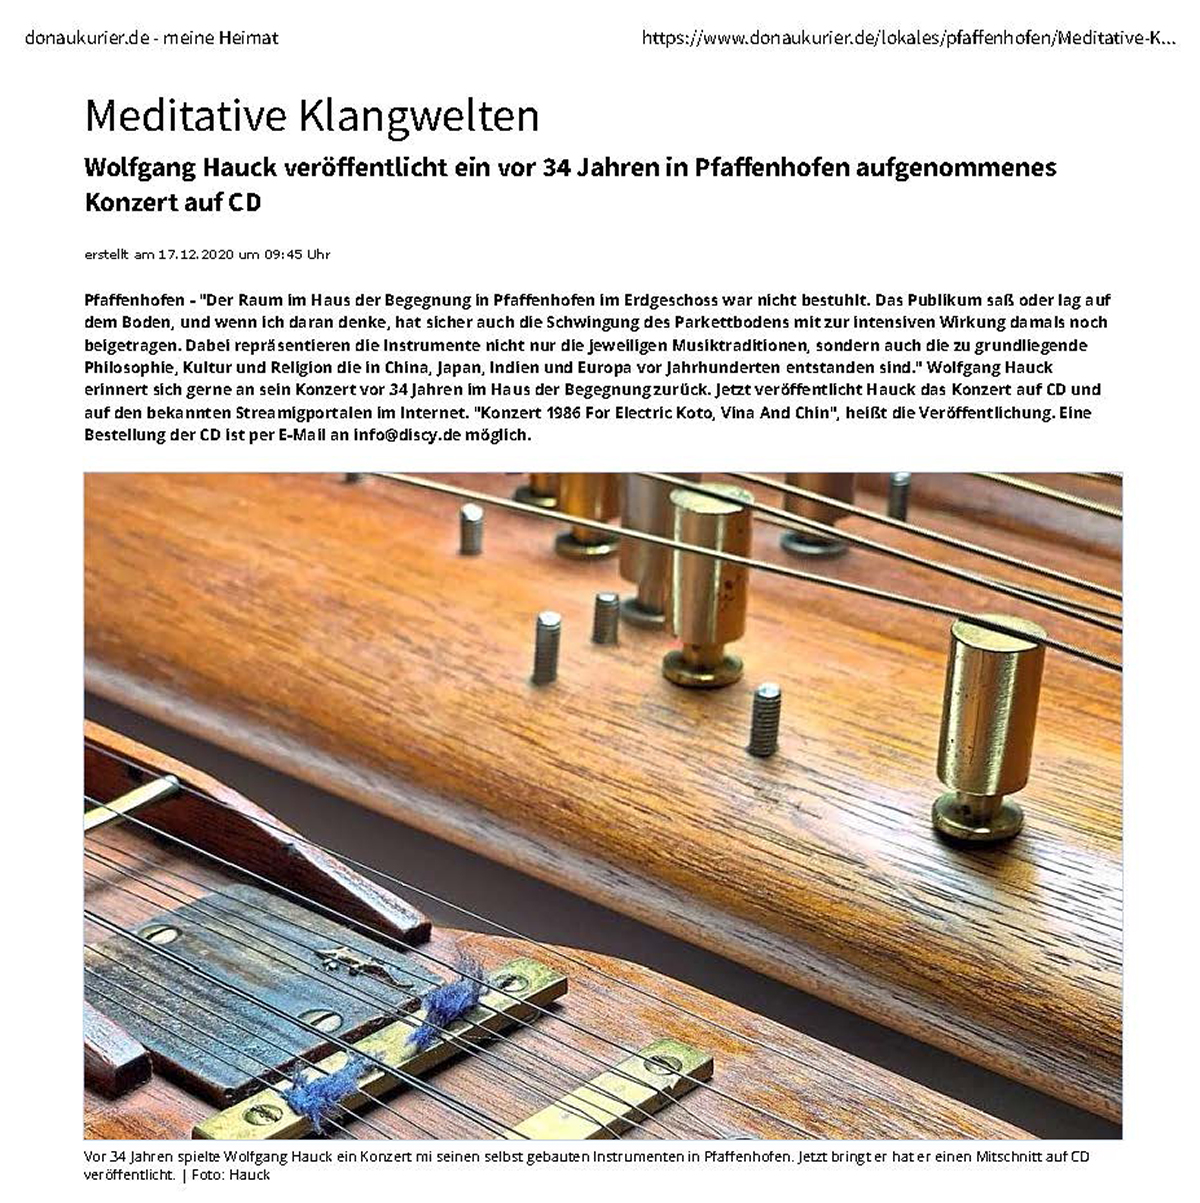 20201217 Pfaffenhofener Kurier Artkel Meditative Klangwelten Wolfgang Hauck Musik 01